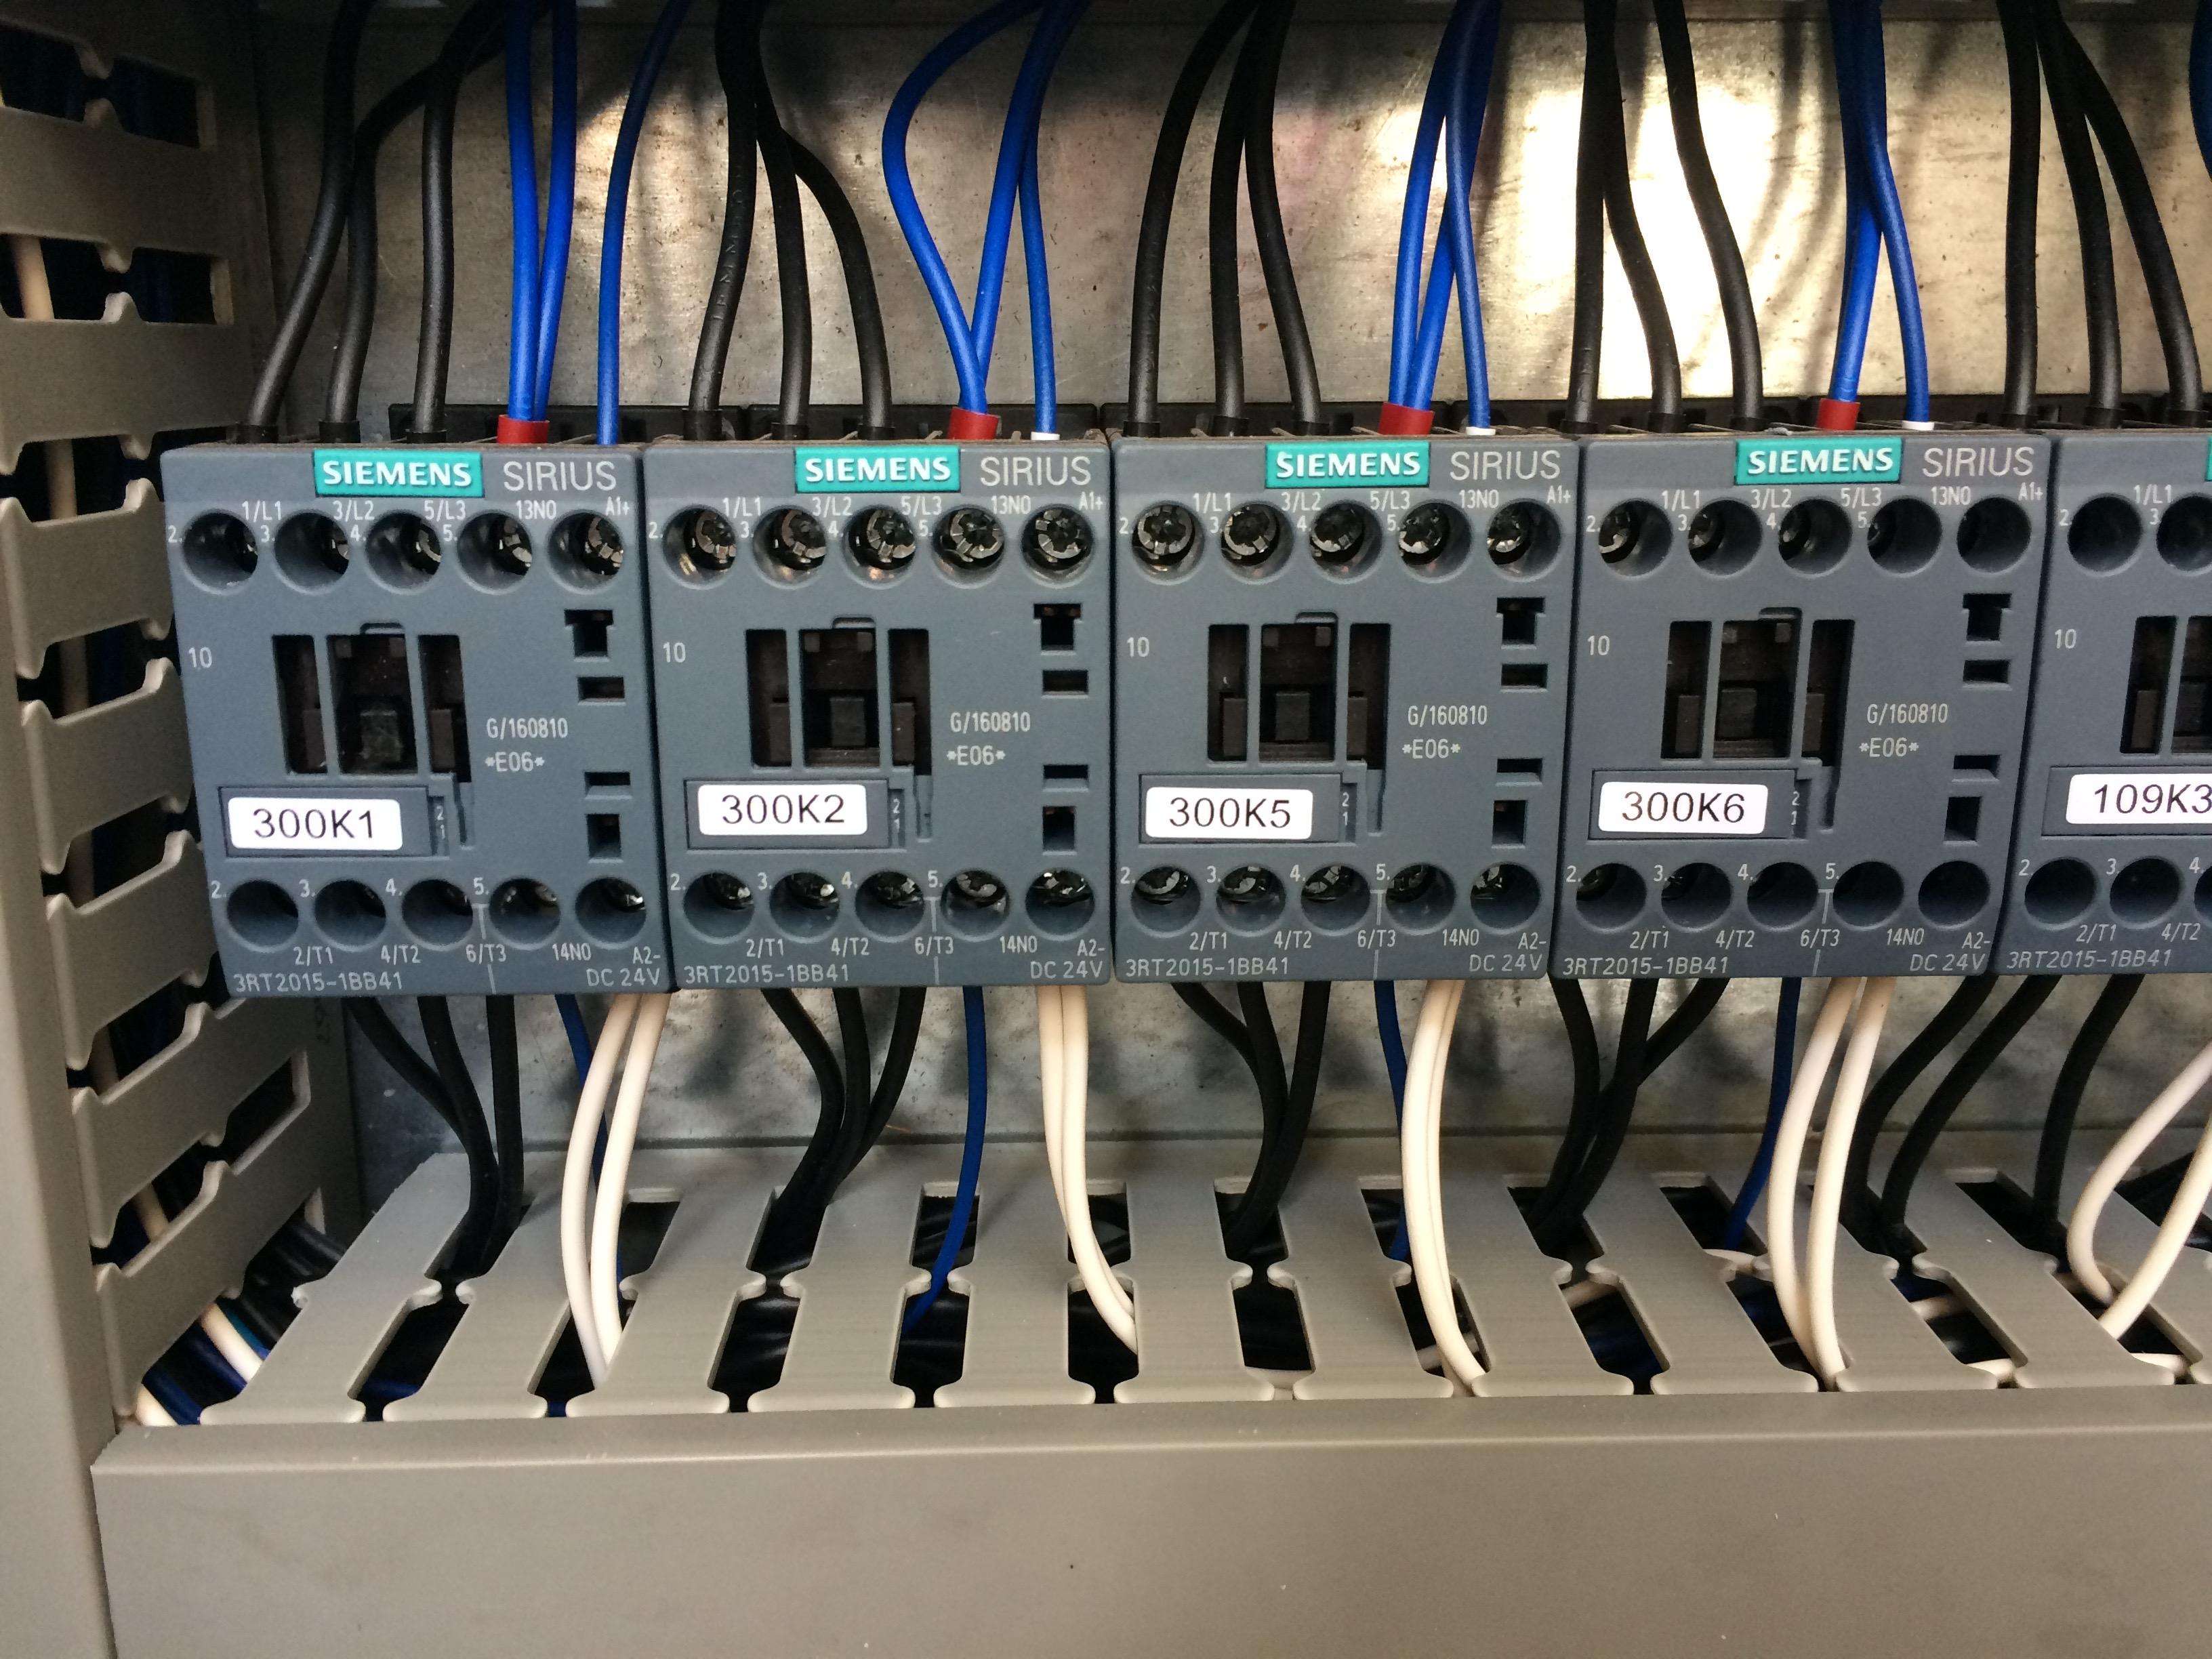 HVAC controls Malta | Environmental control system | Air conditioning and HVAC